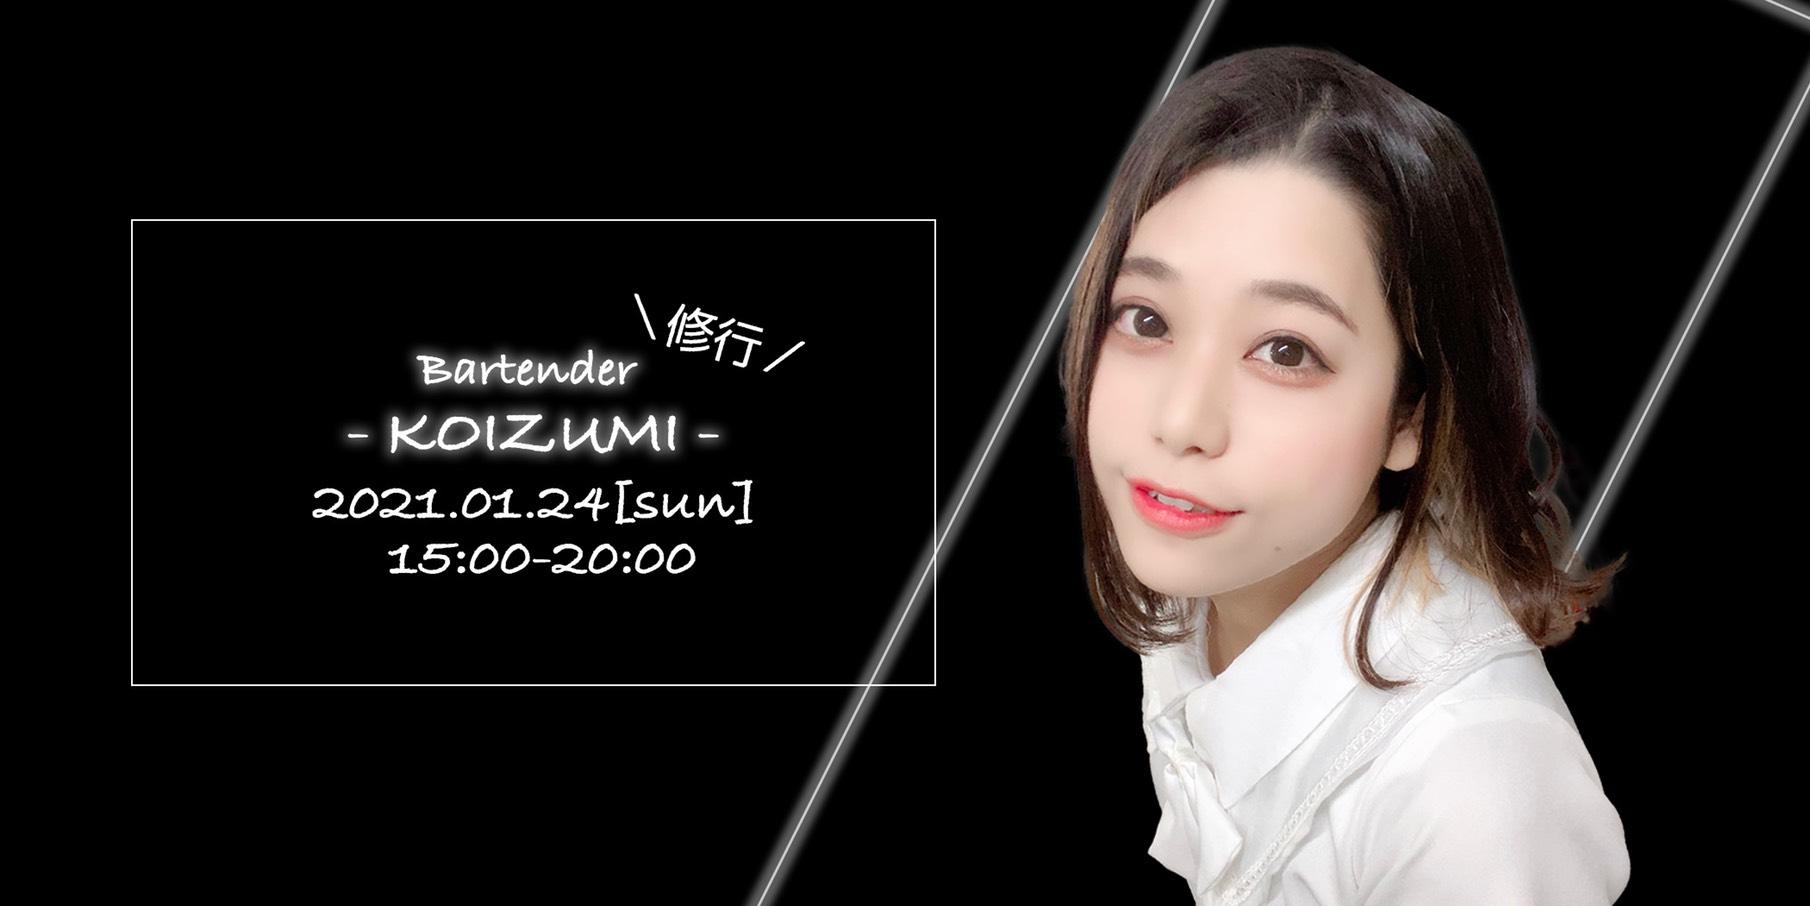 Bartender 修行 - KOIZUMI -